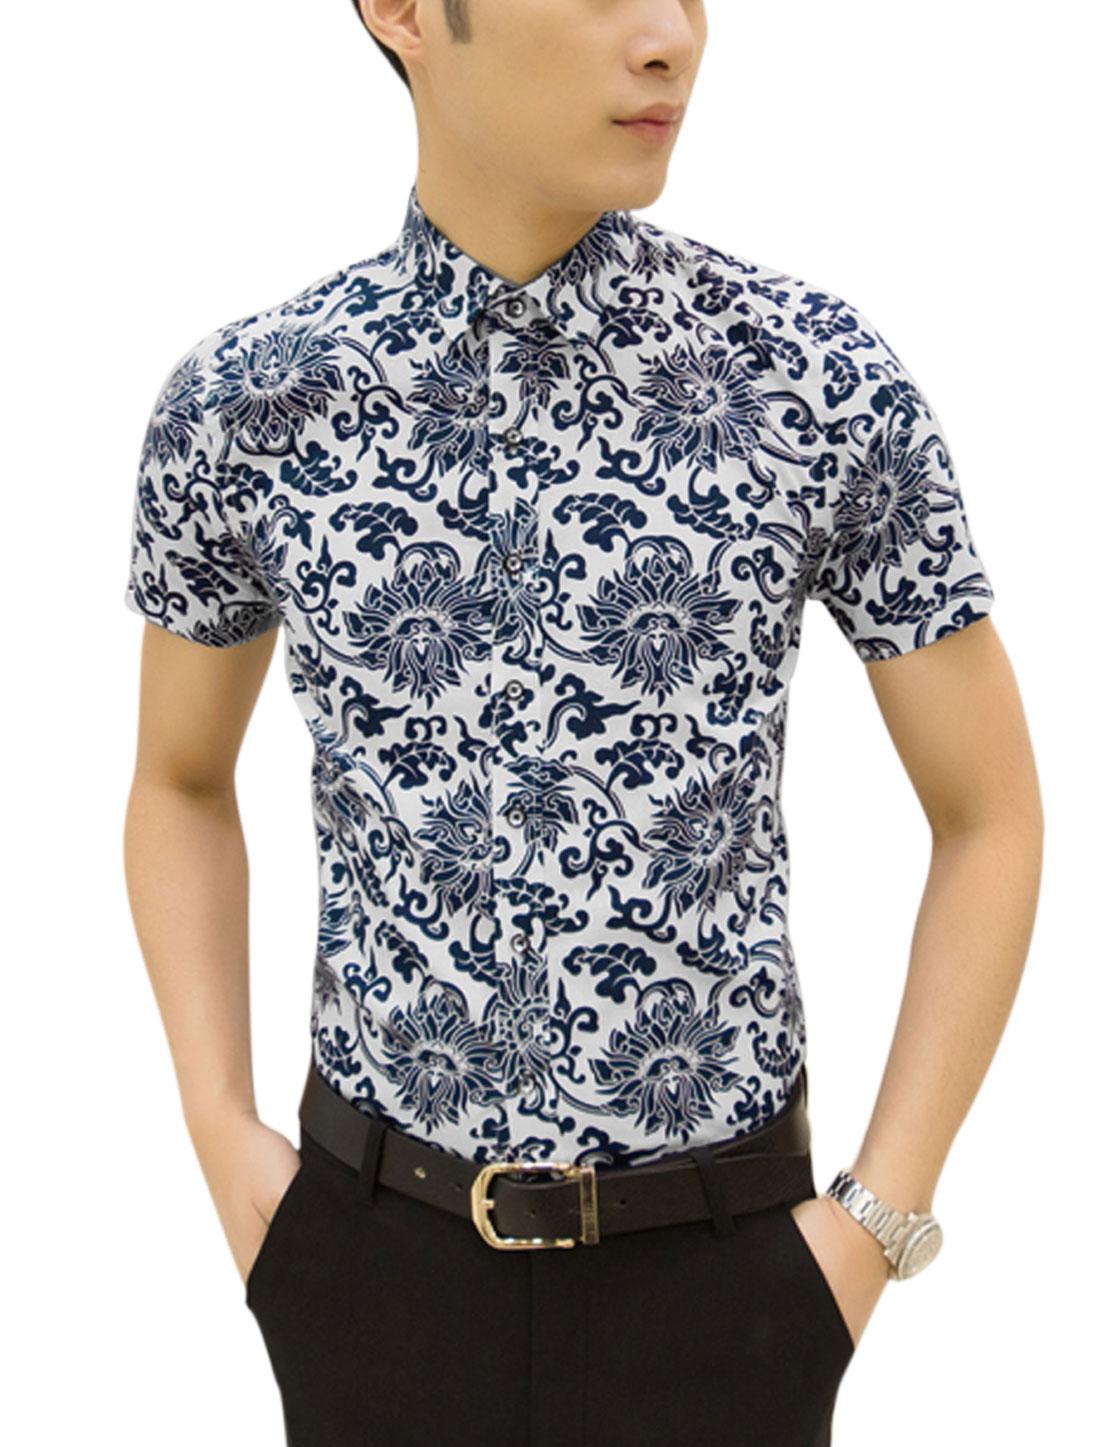 Man Floral Prints Short Sleeves Casual Shirt Navy Blue White M